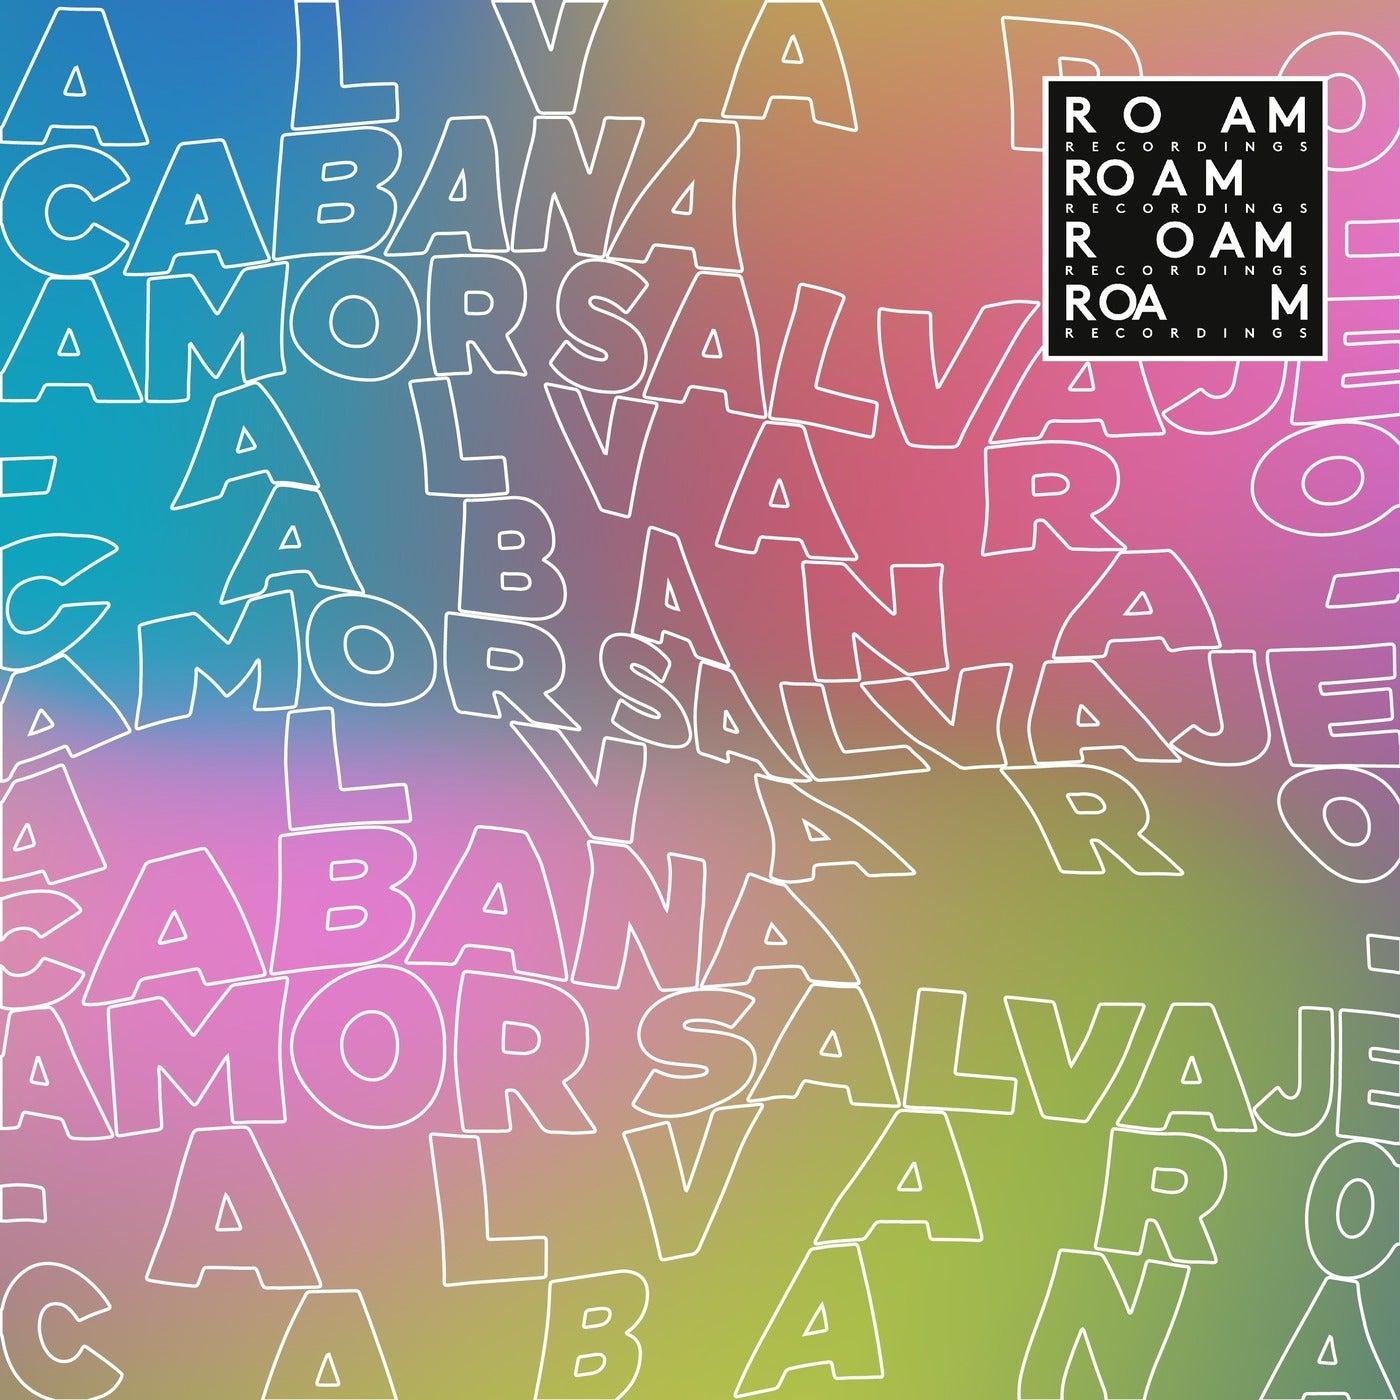 Amor Salvaje (Original Mix)